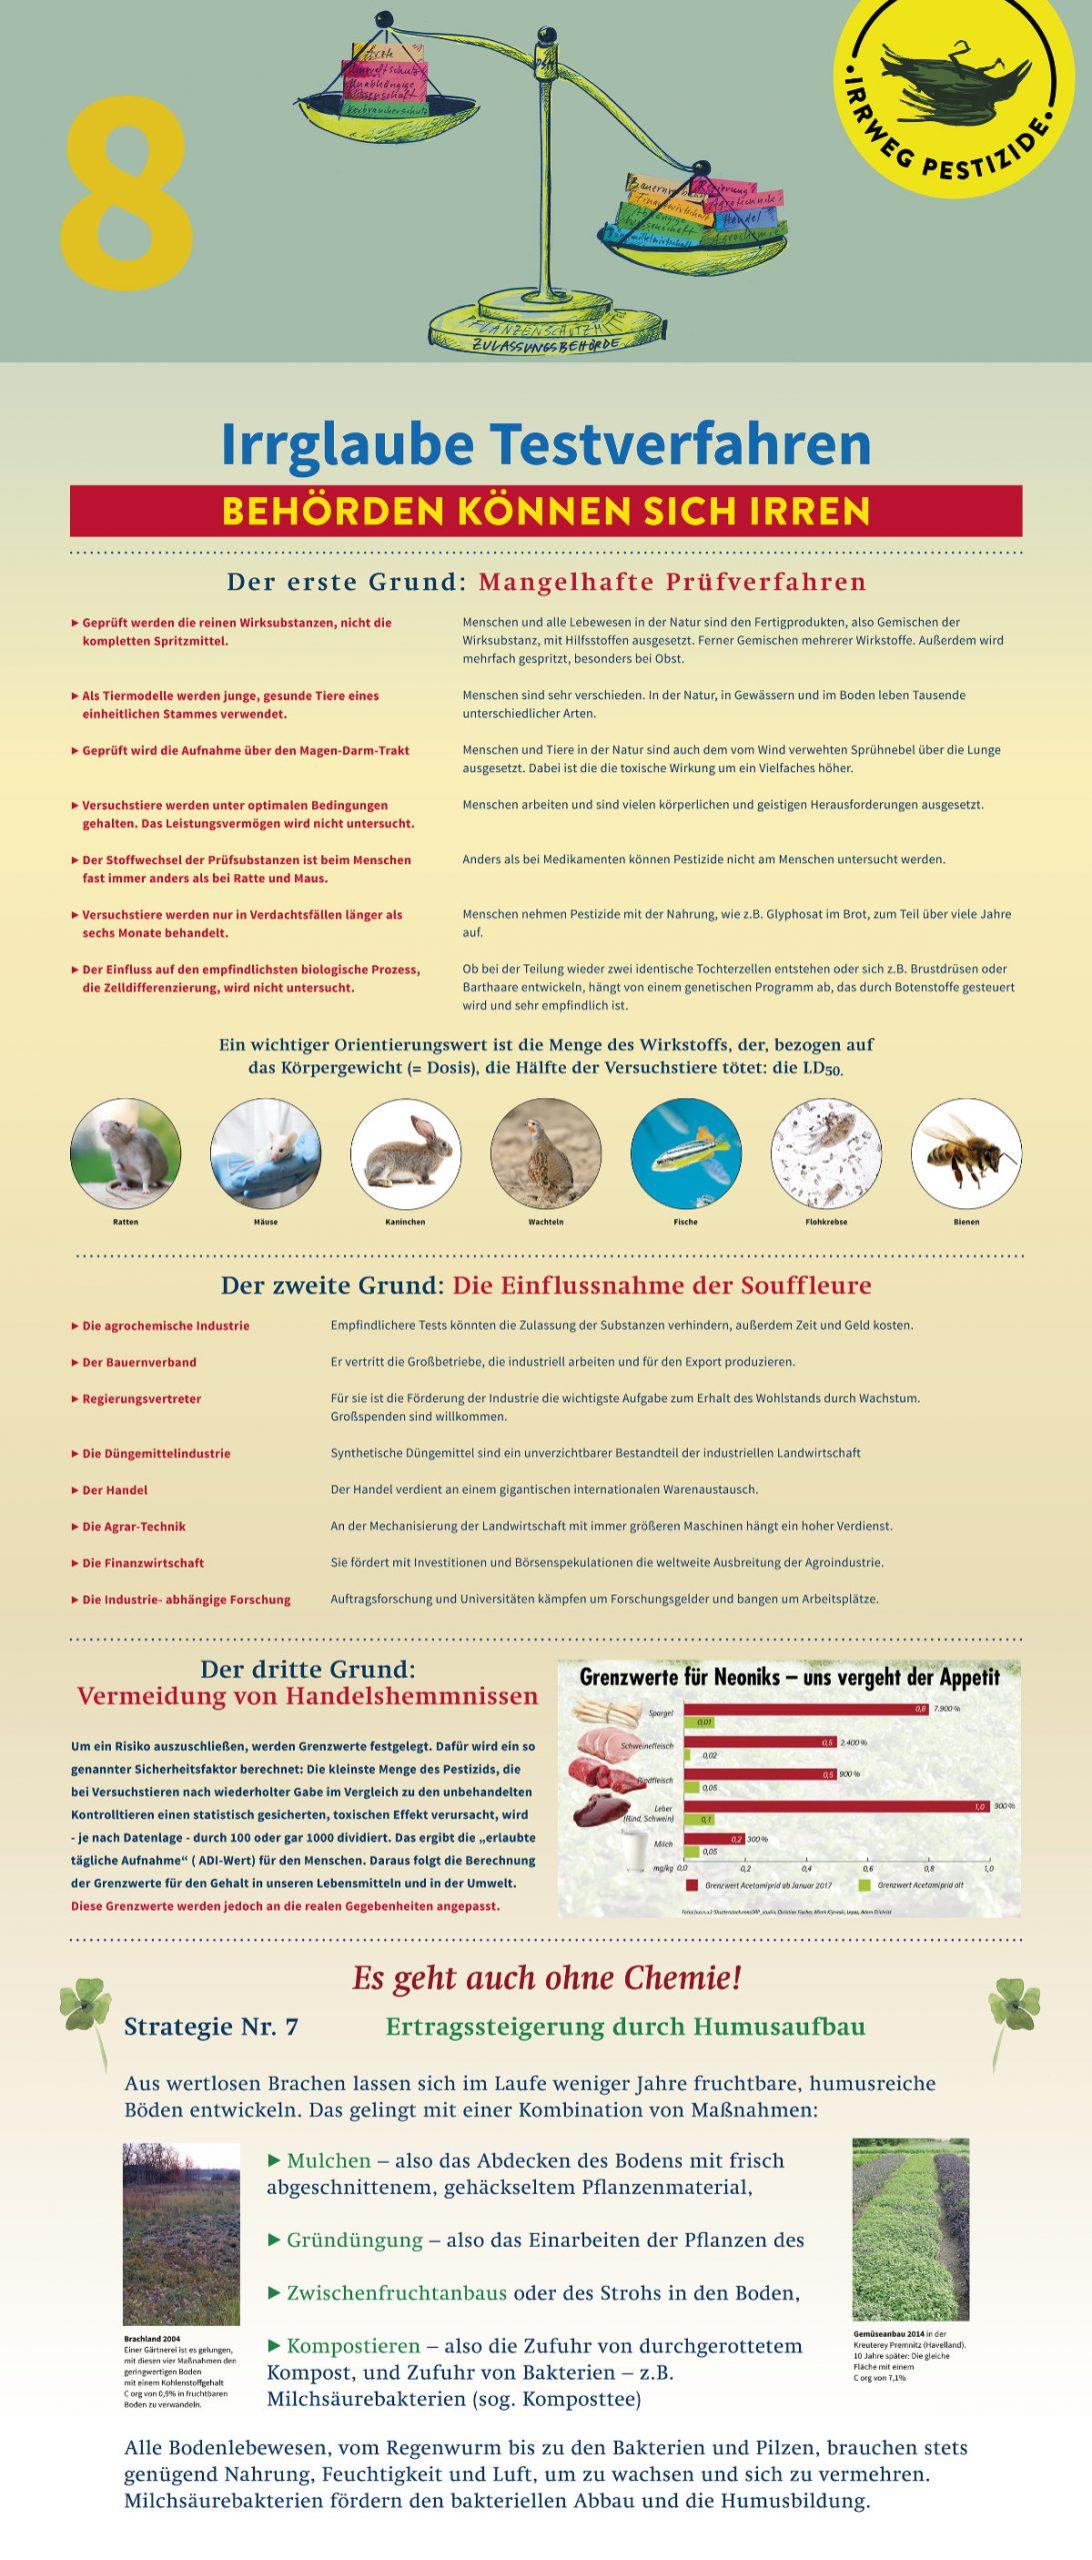 Irrweg Pestizide Irrglaube Testverfahren